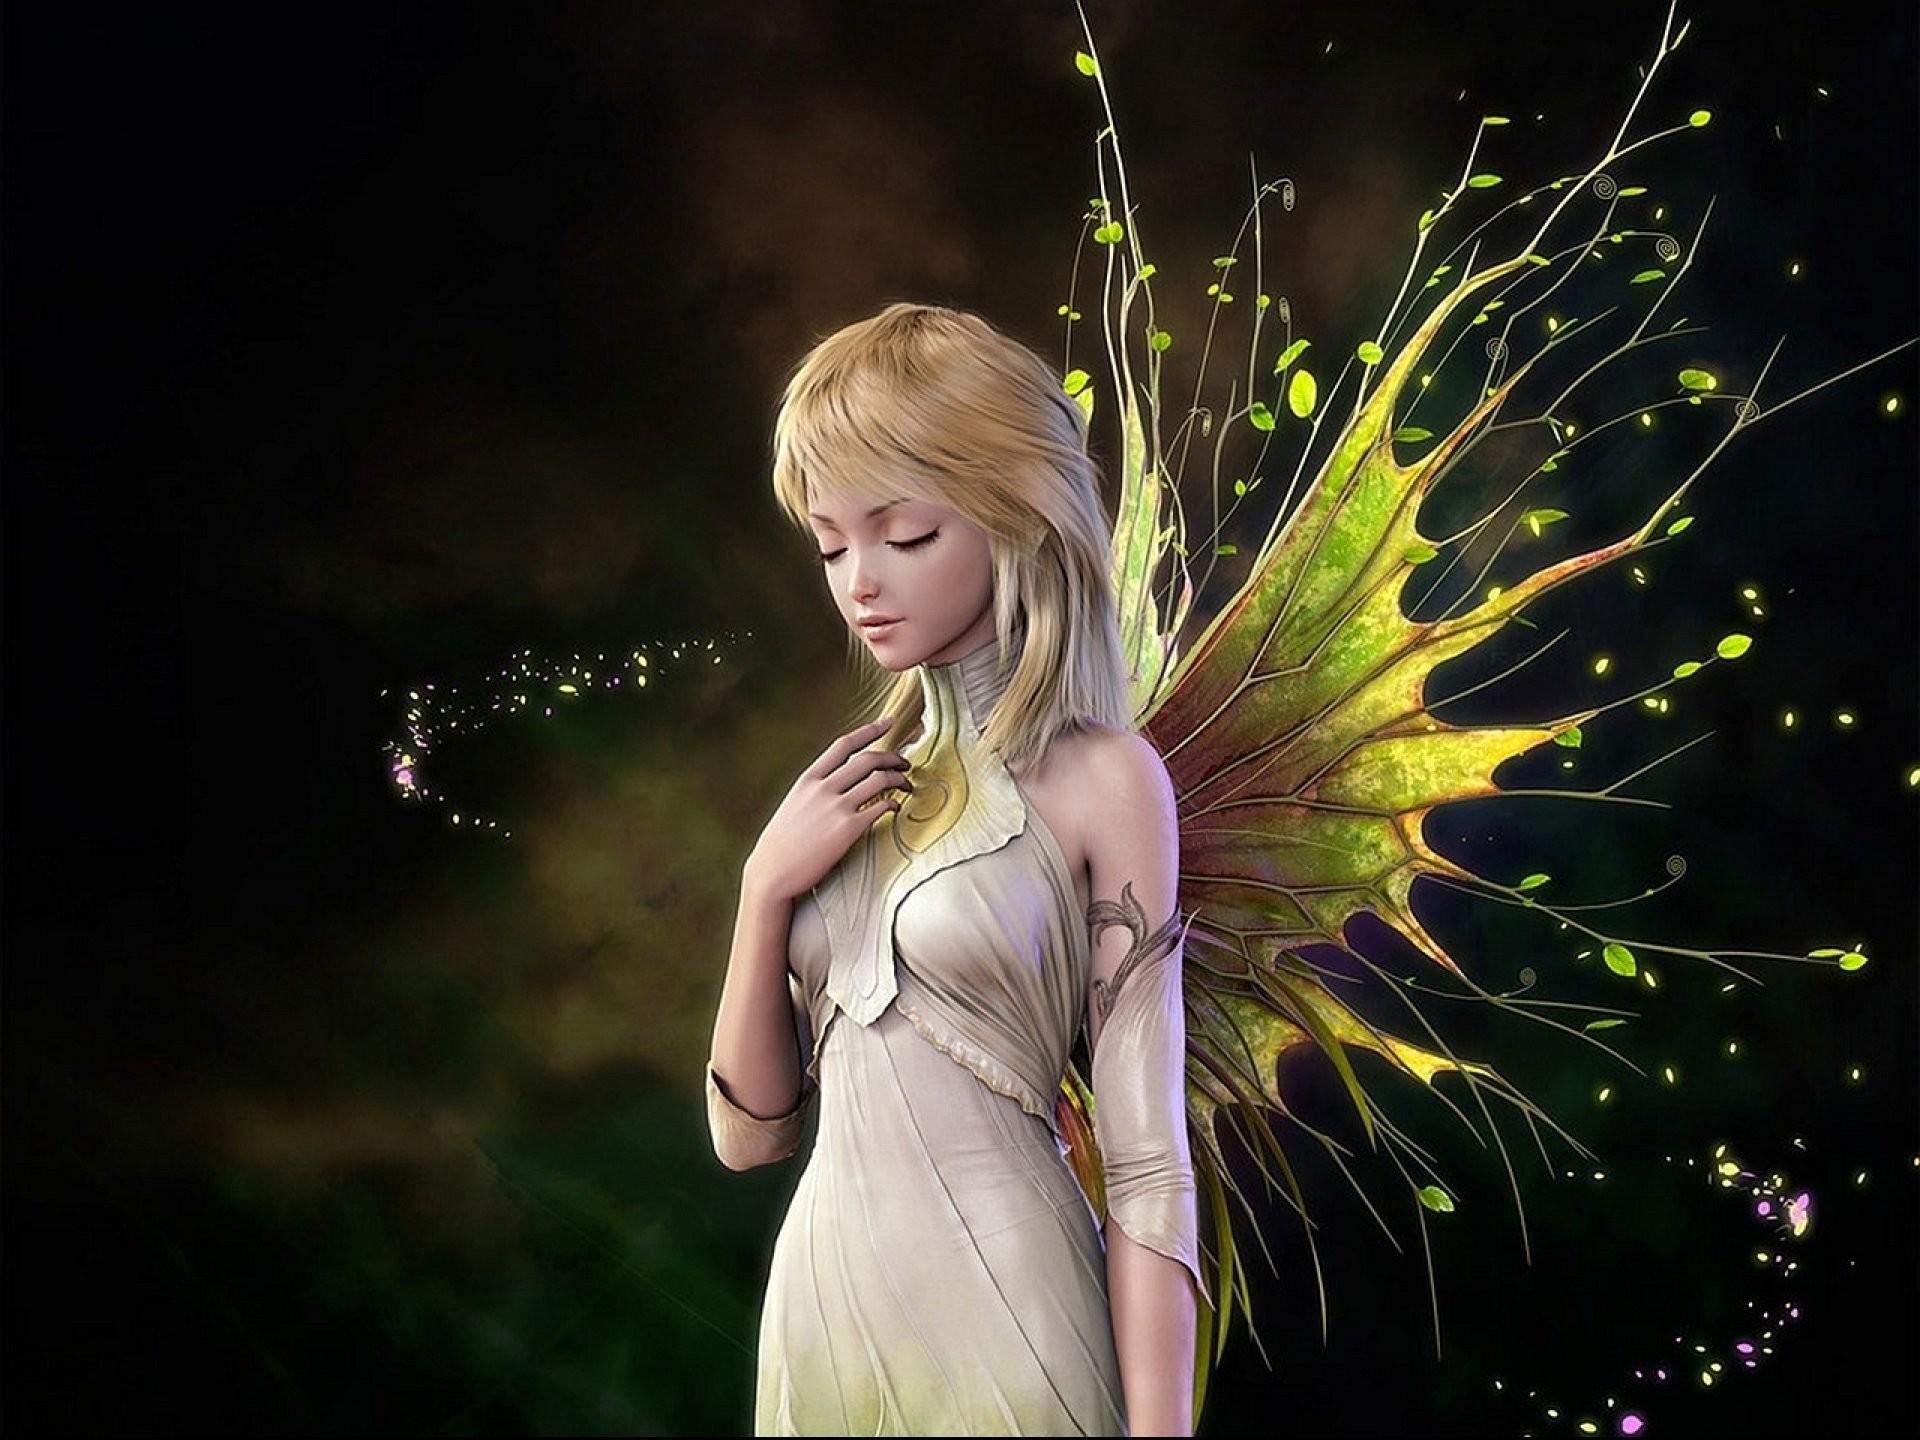 Res: 1920x1440, High Resolution, artwork,fairy, fairies, art free wallpaper, girl, Laptop,  horror, fantasy, free Wallpaper HD